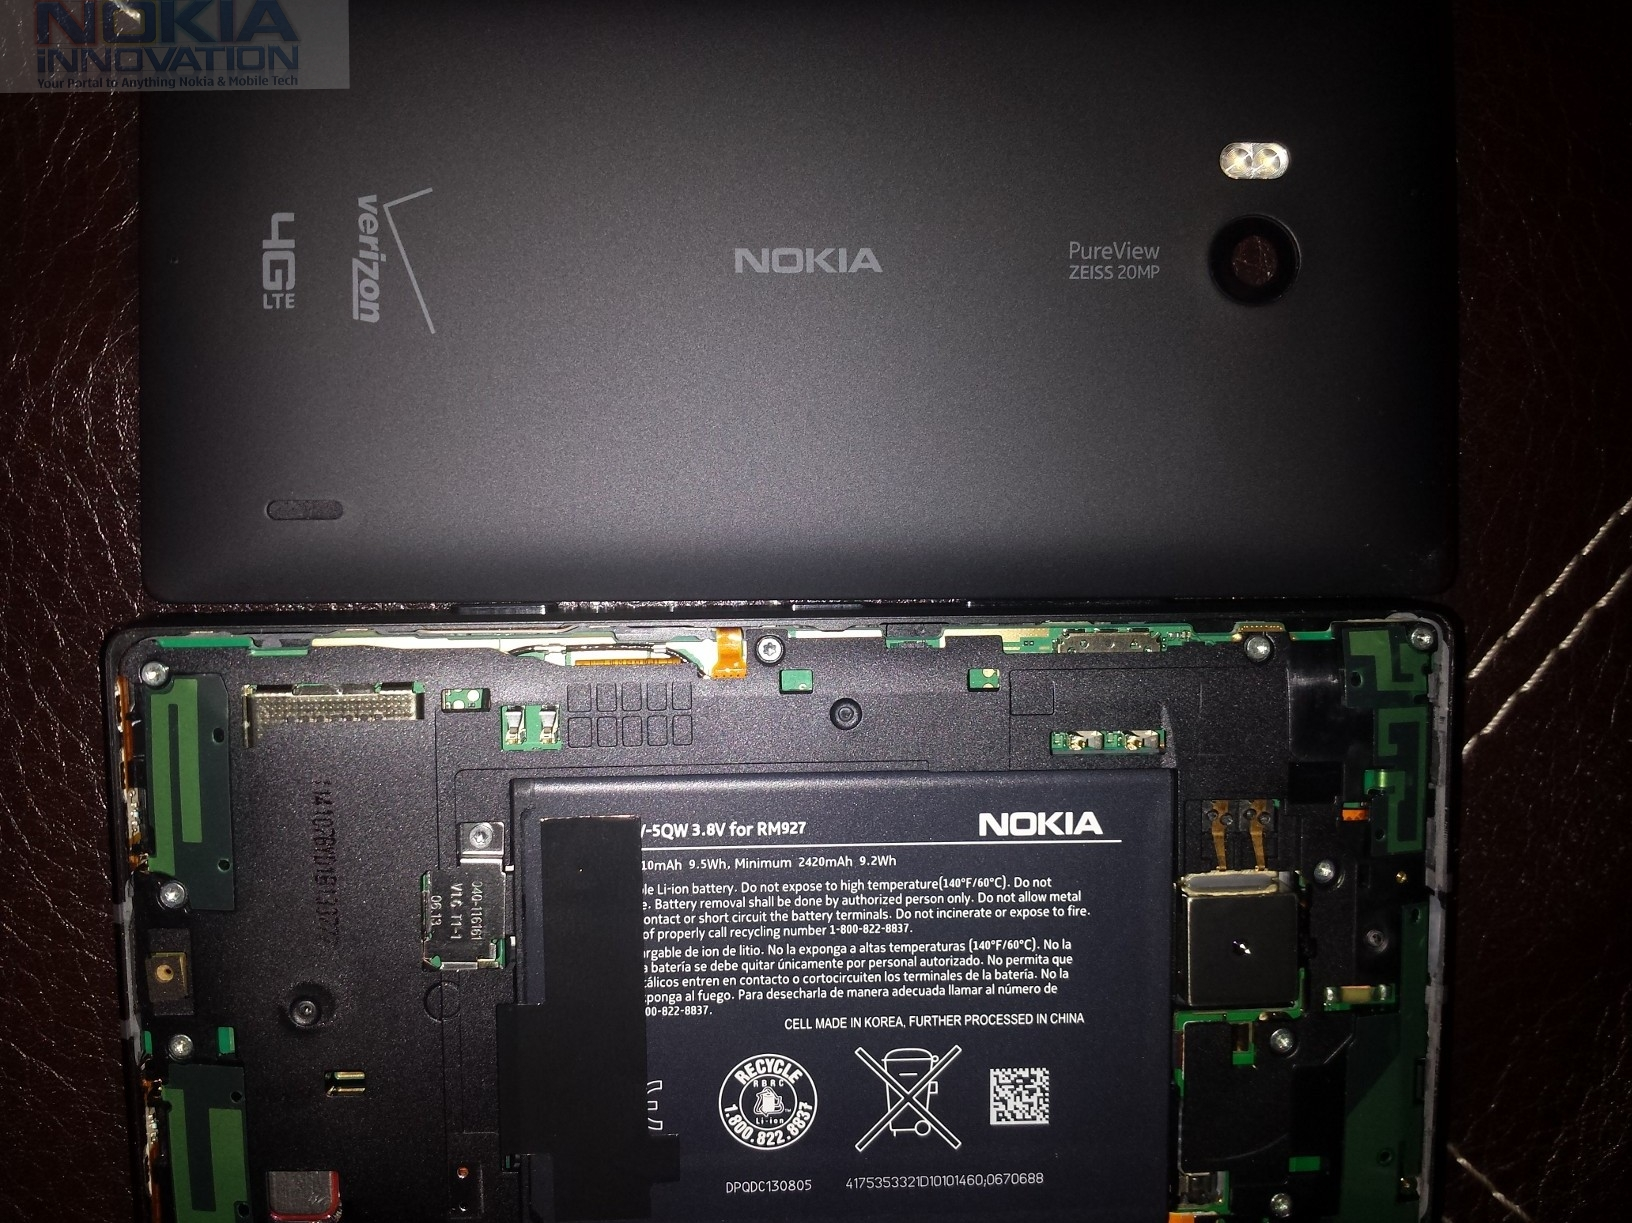 New Nokia Lumia 929 Leaked Photos Show the Phone's Internals